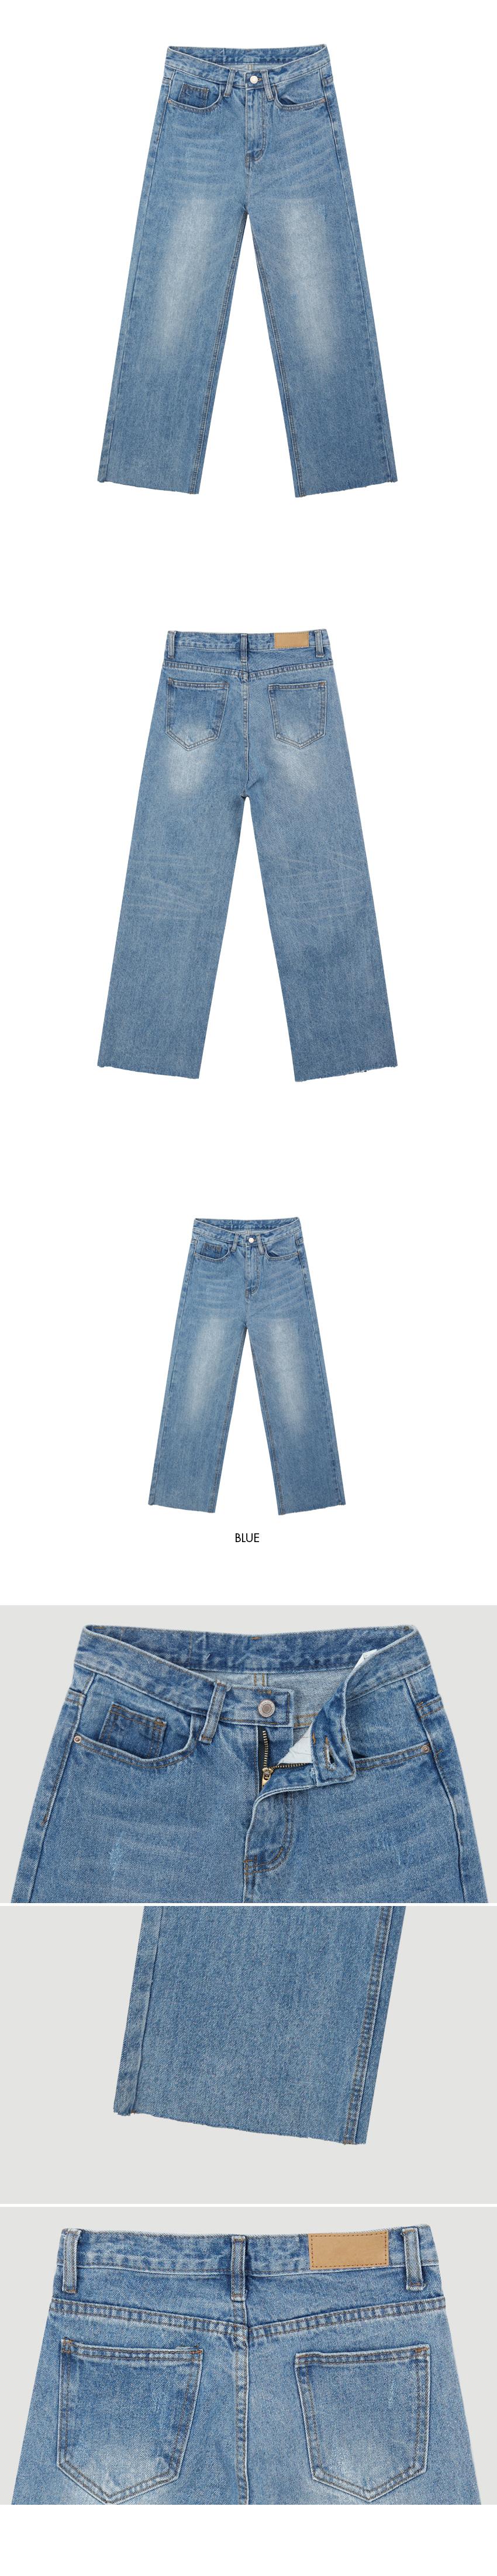 915 Straight pants